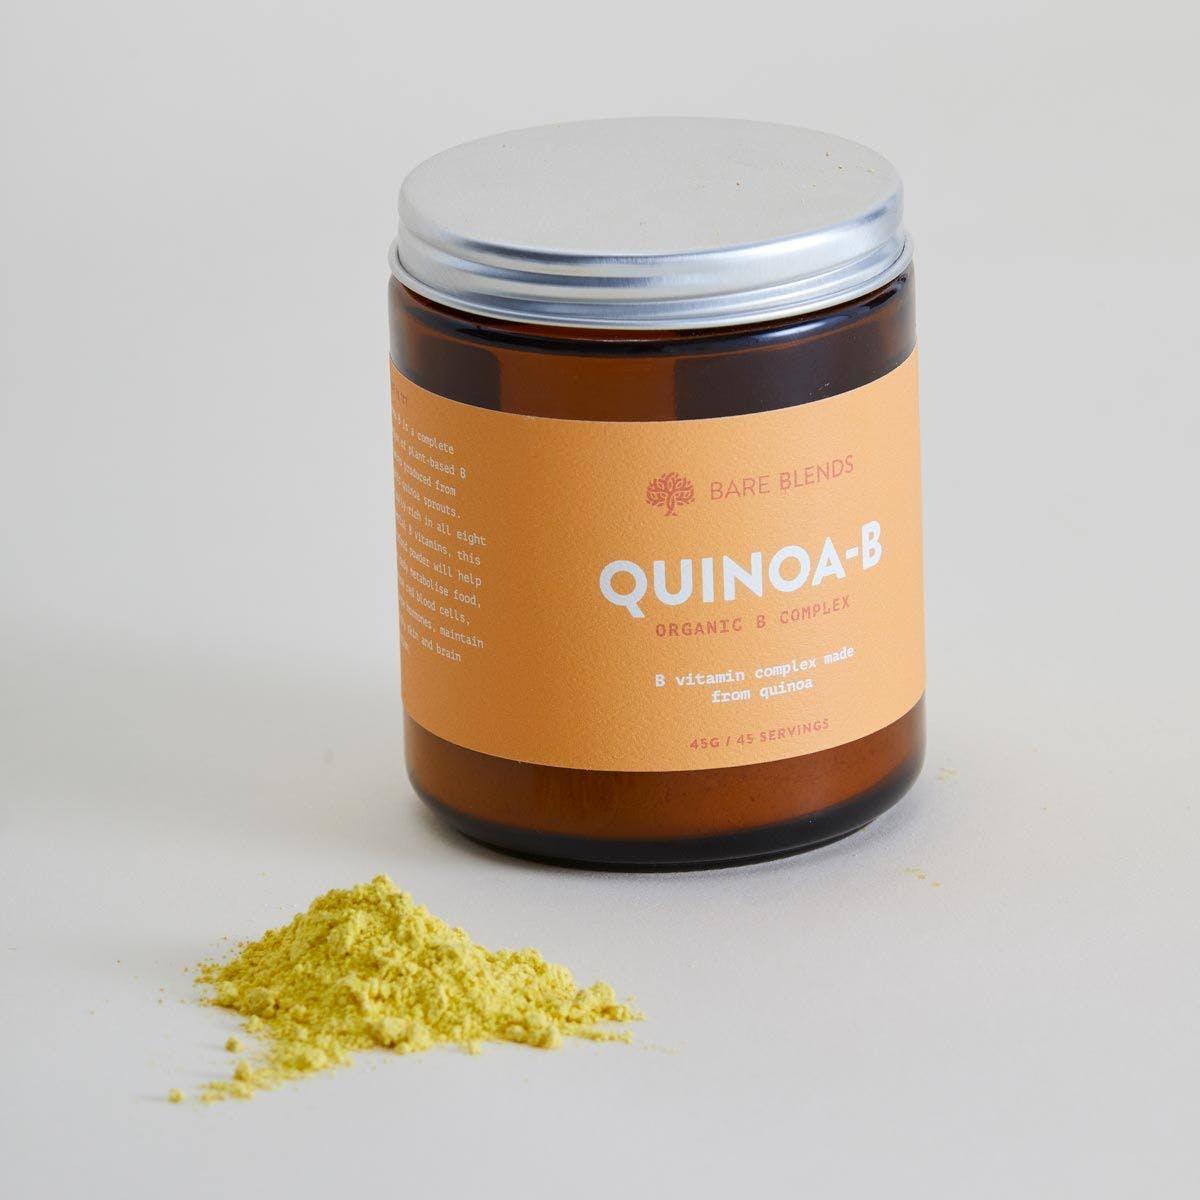 Quinoa-B